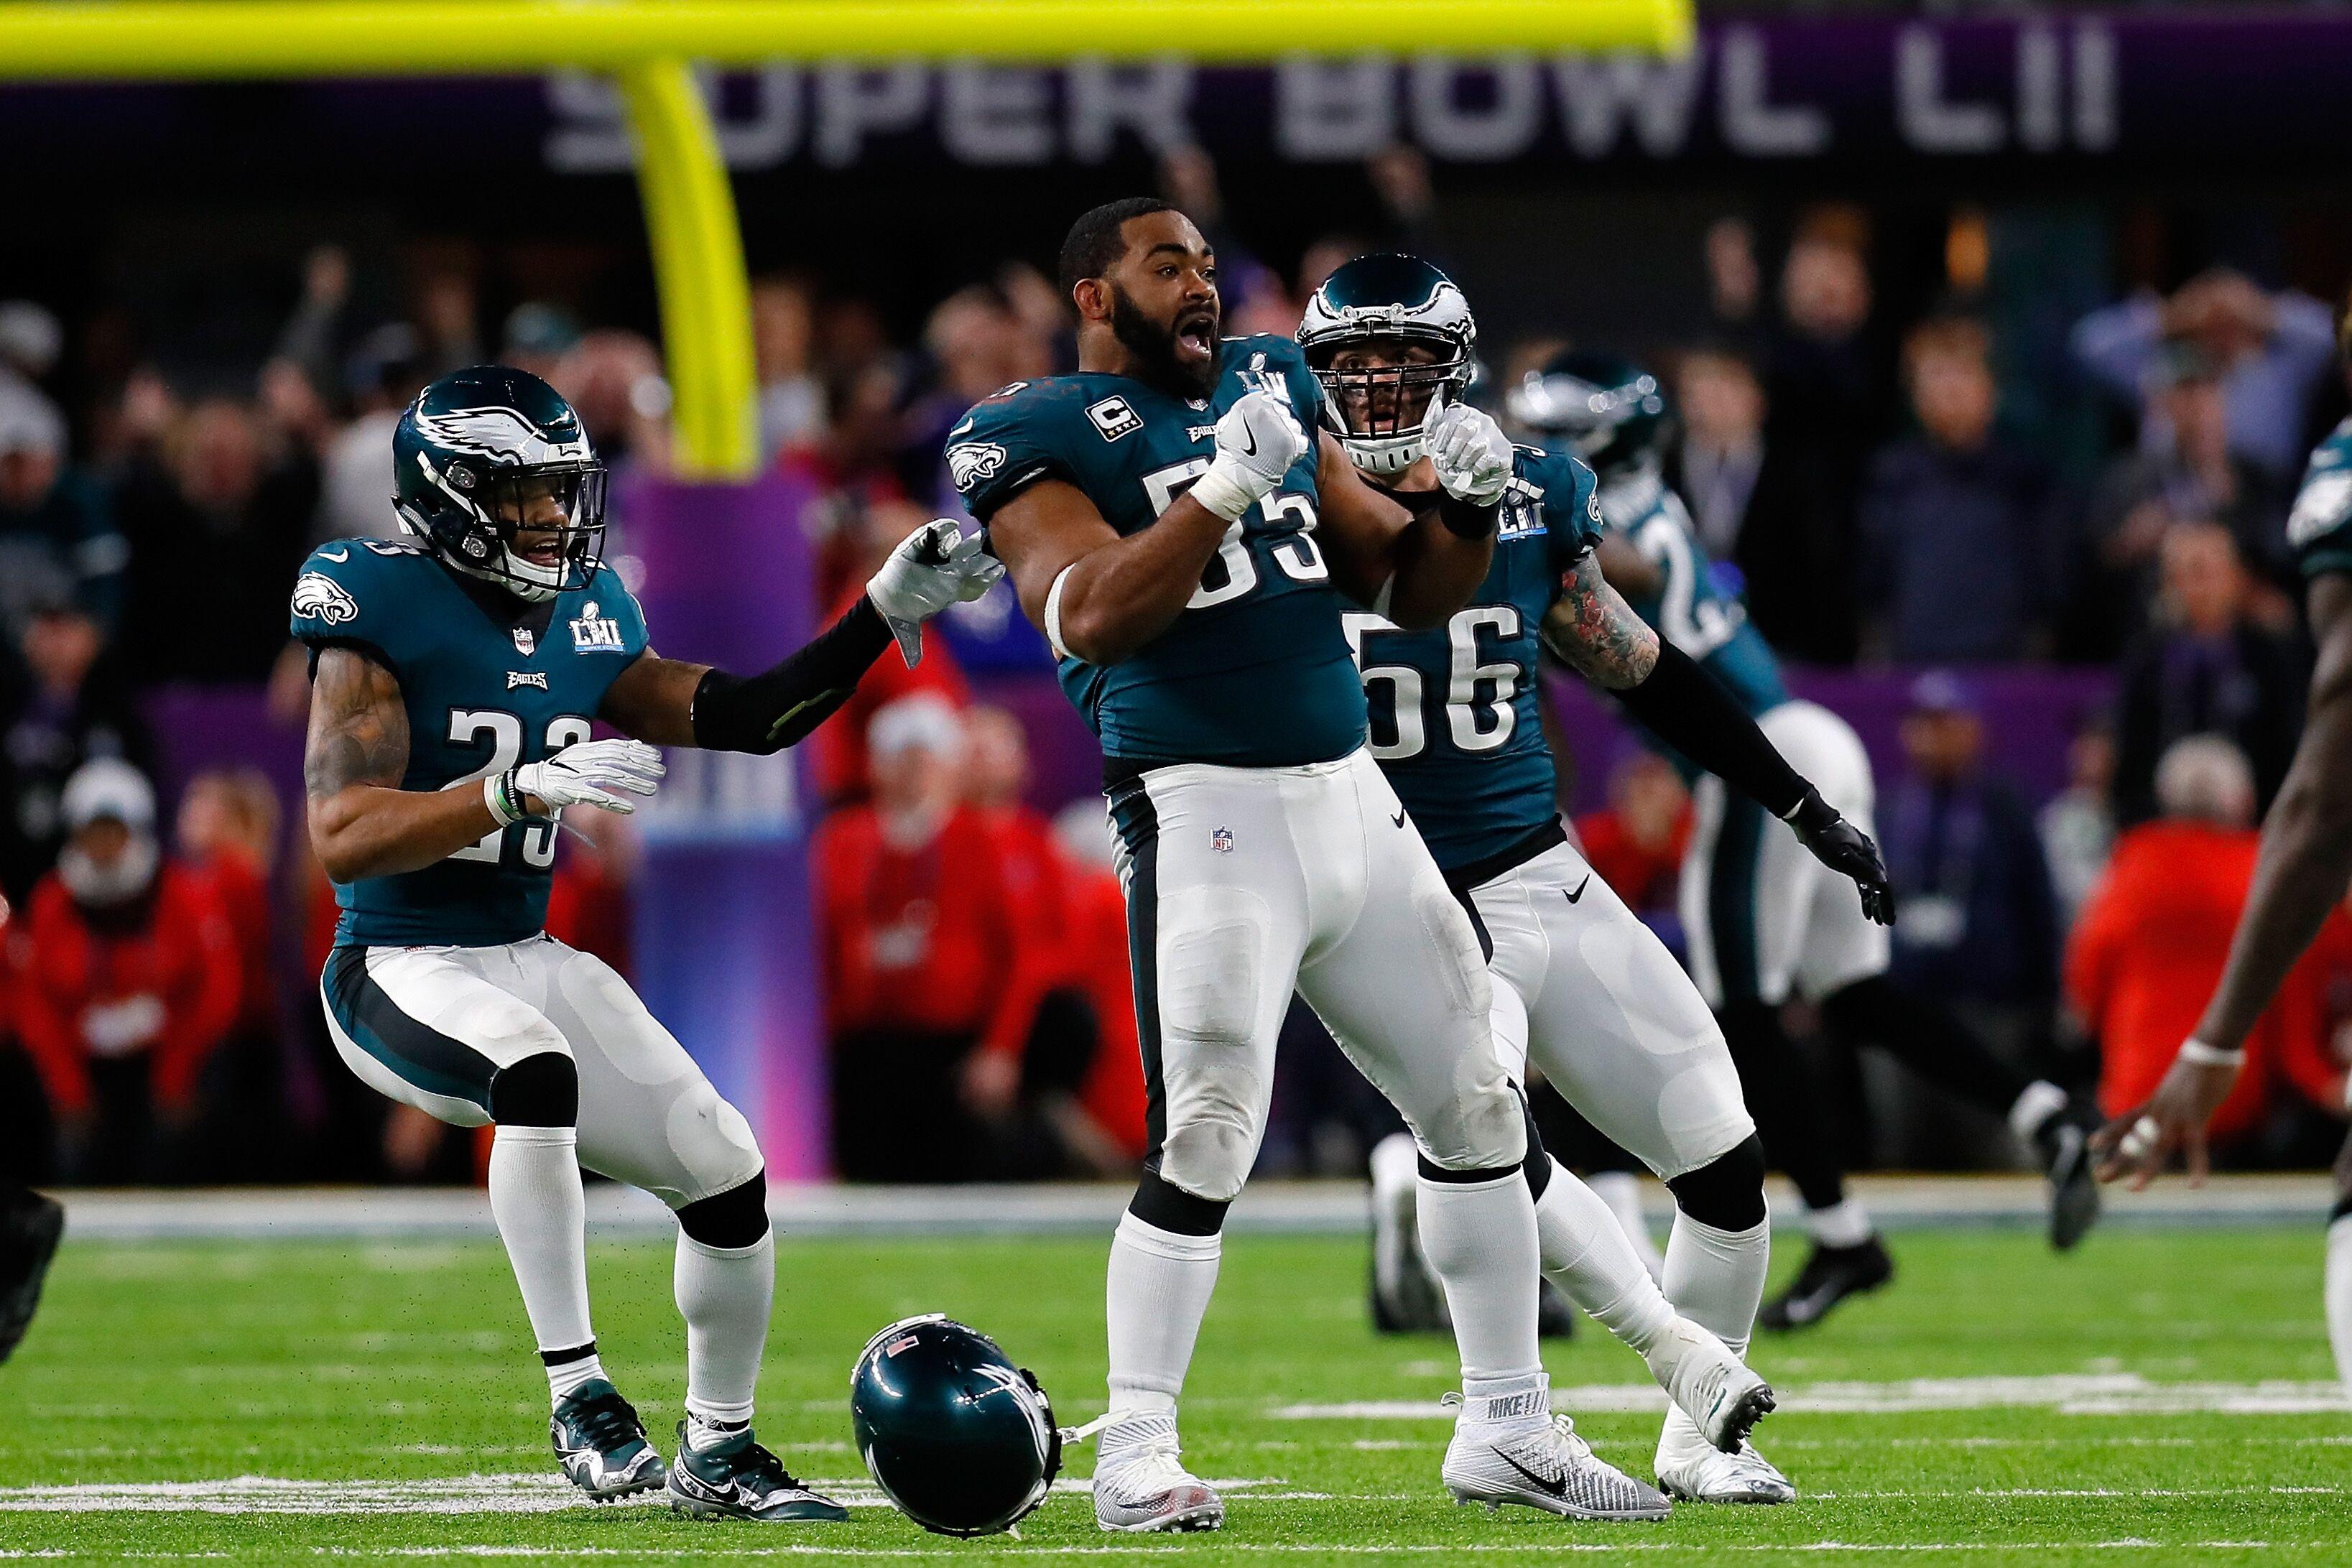 d7c82053ef5 Michigan Football: Brandon Graham deserved his Super Bowl moment